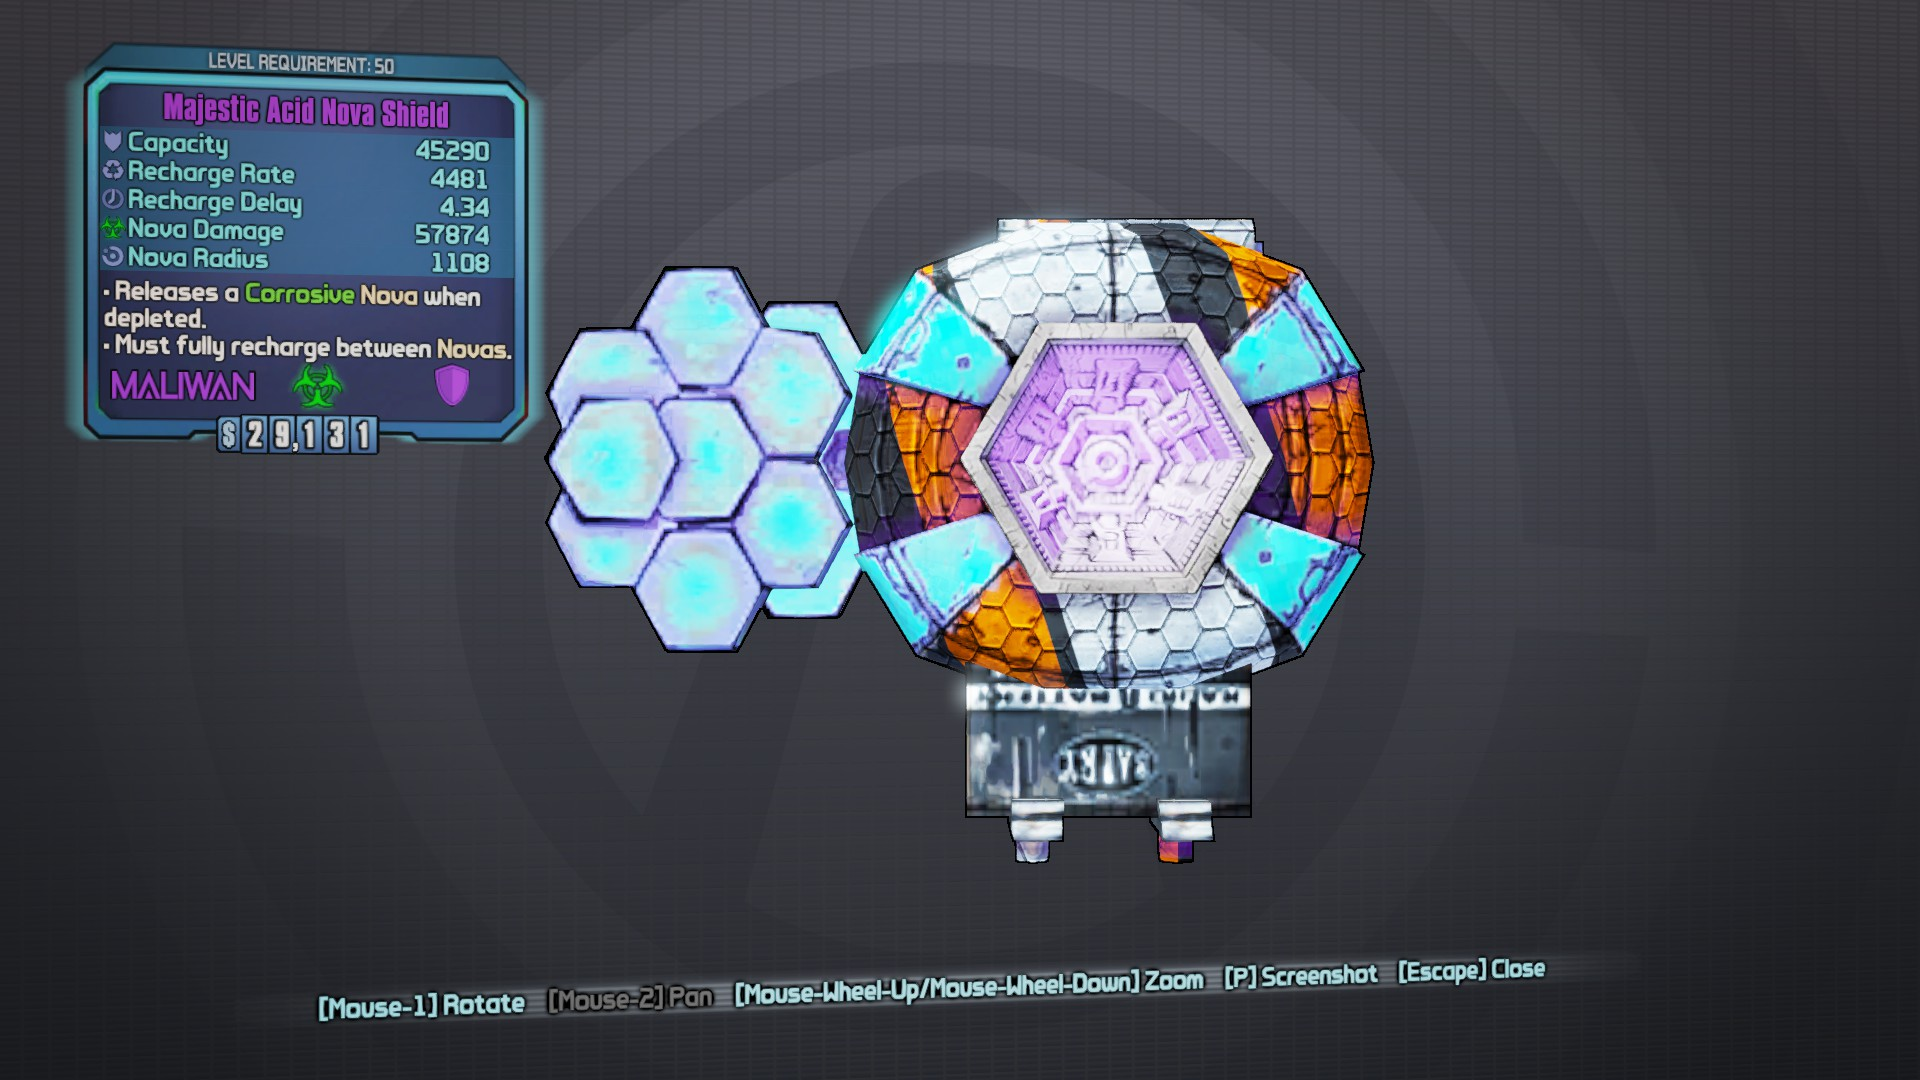 Nova Shield